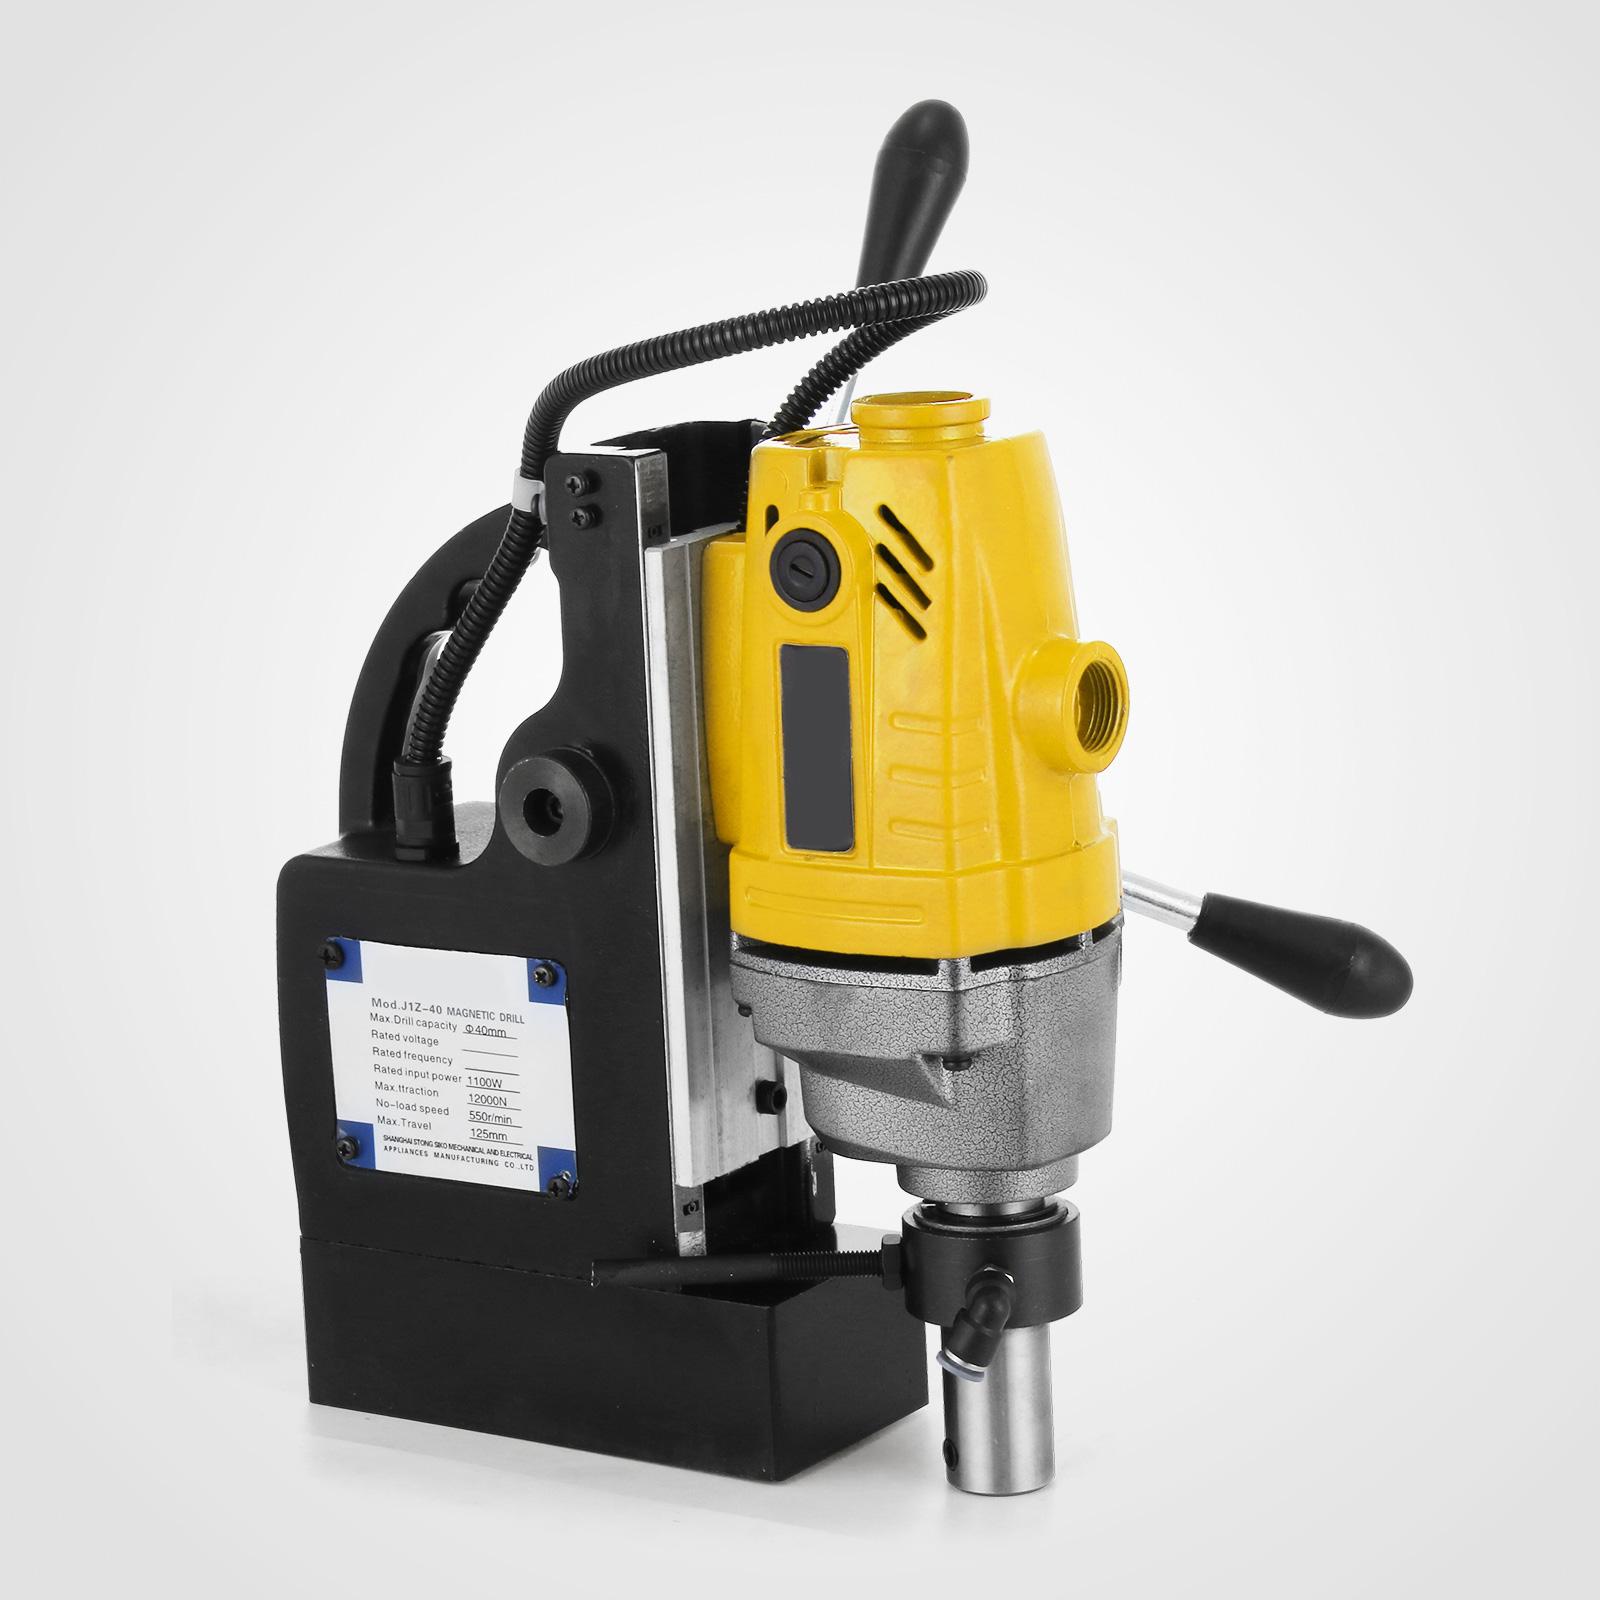 MB23-BRM35-MD40-Trapano-Perforatrice-Carotatore-Fresa-Magnetico-12-40mm-230V miniatura 29